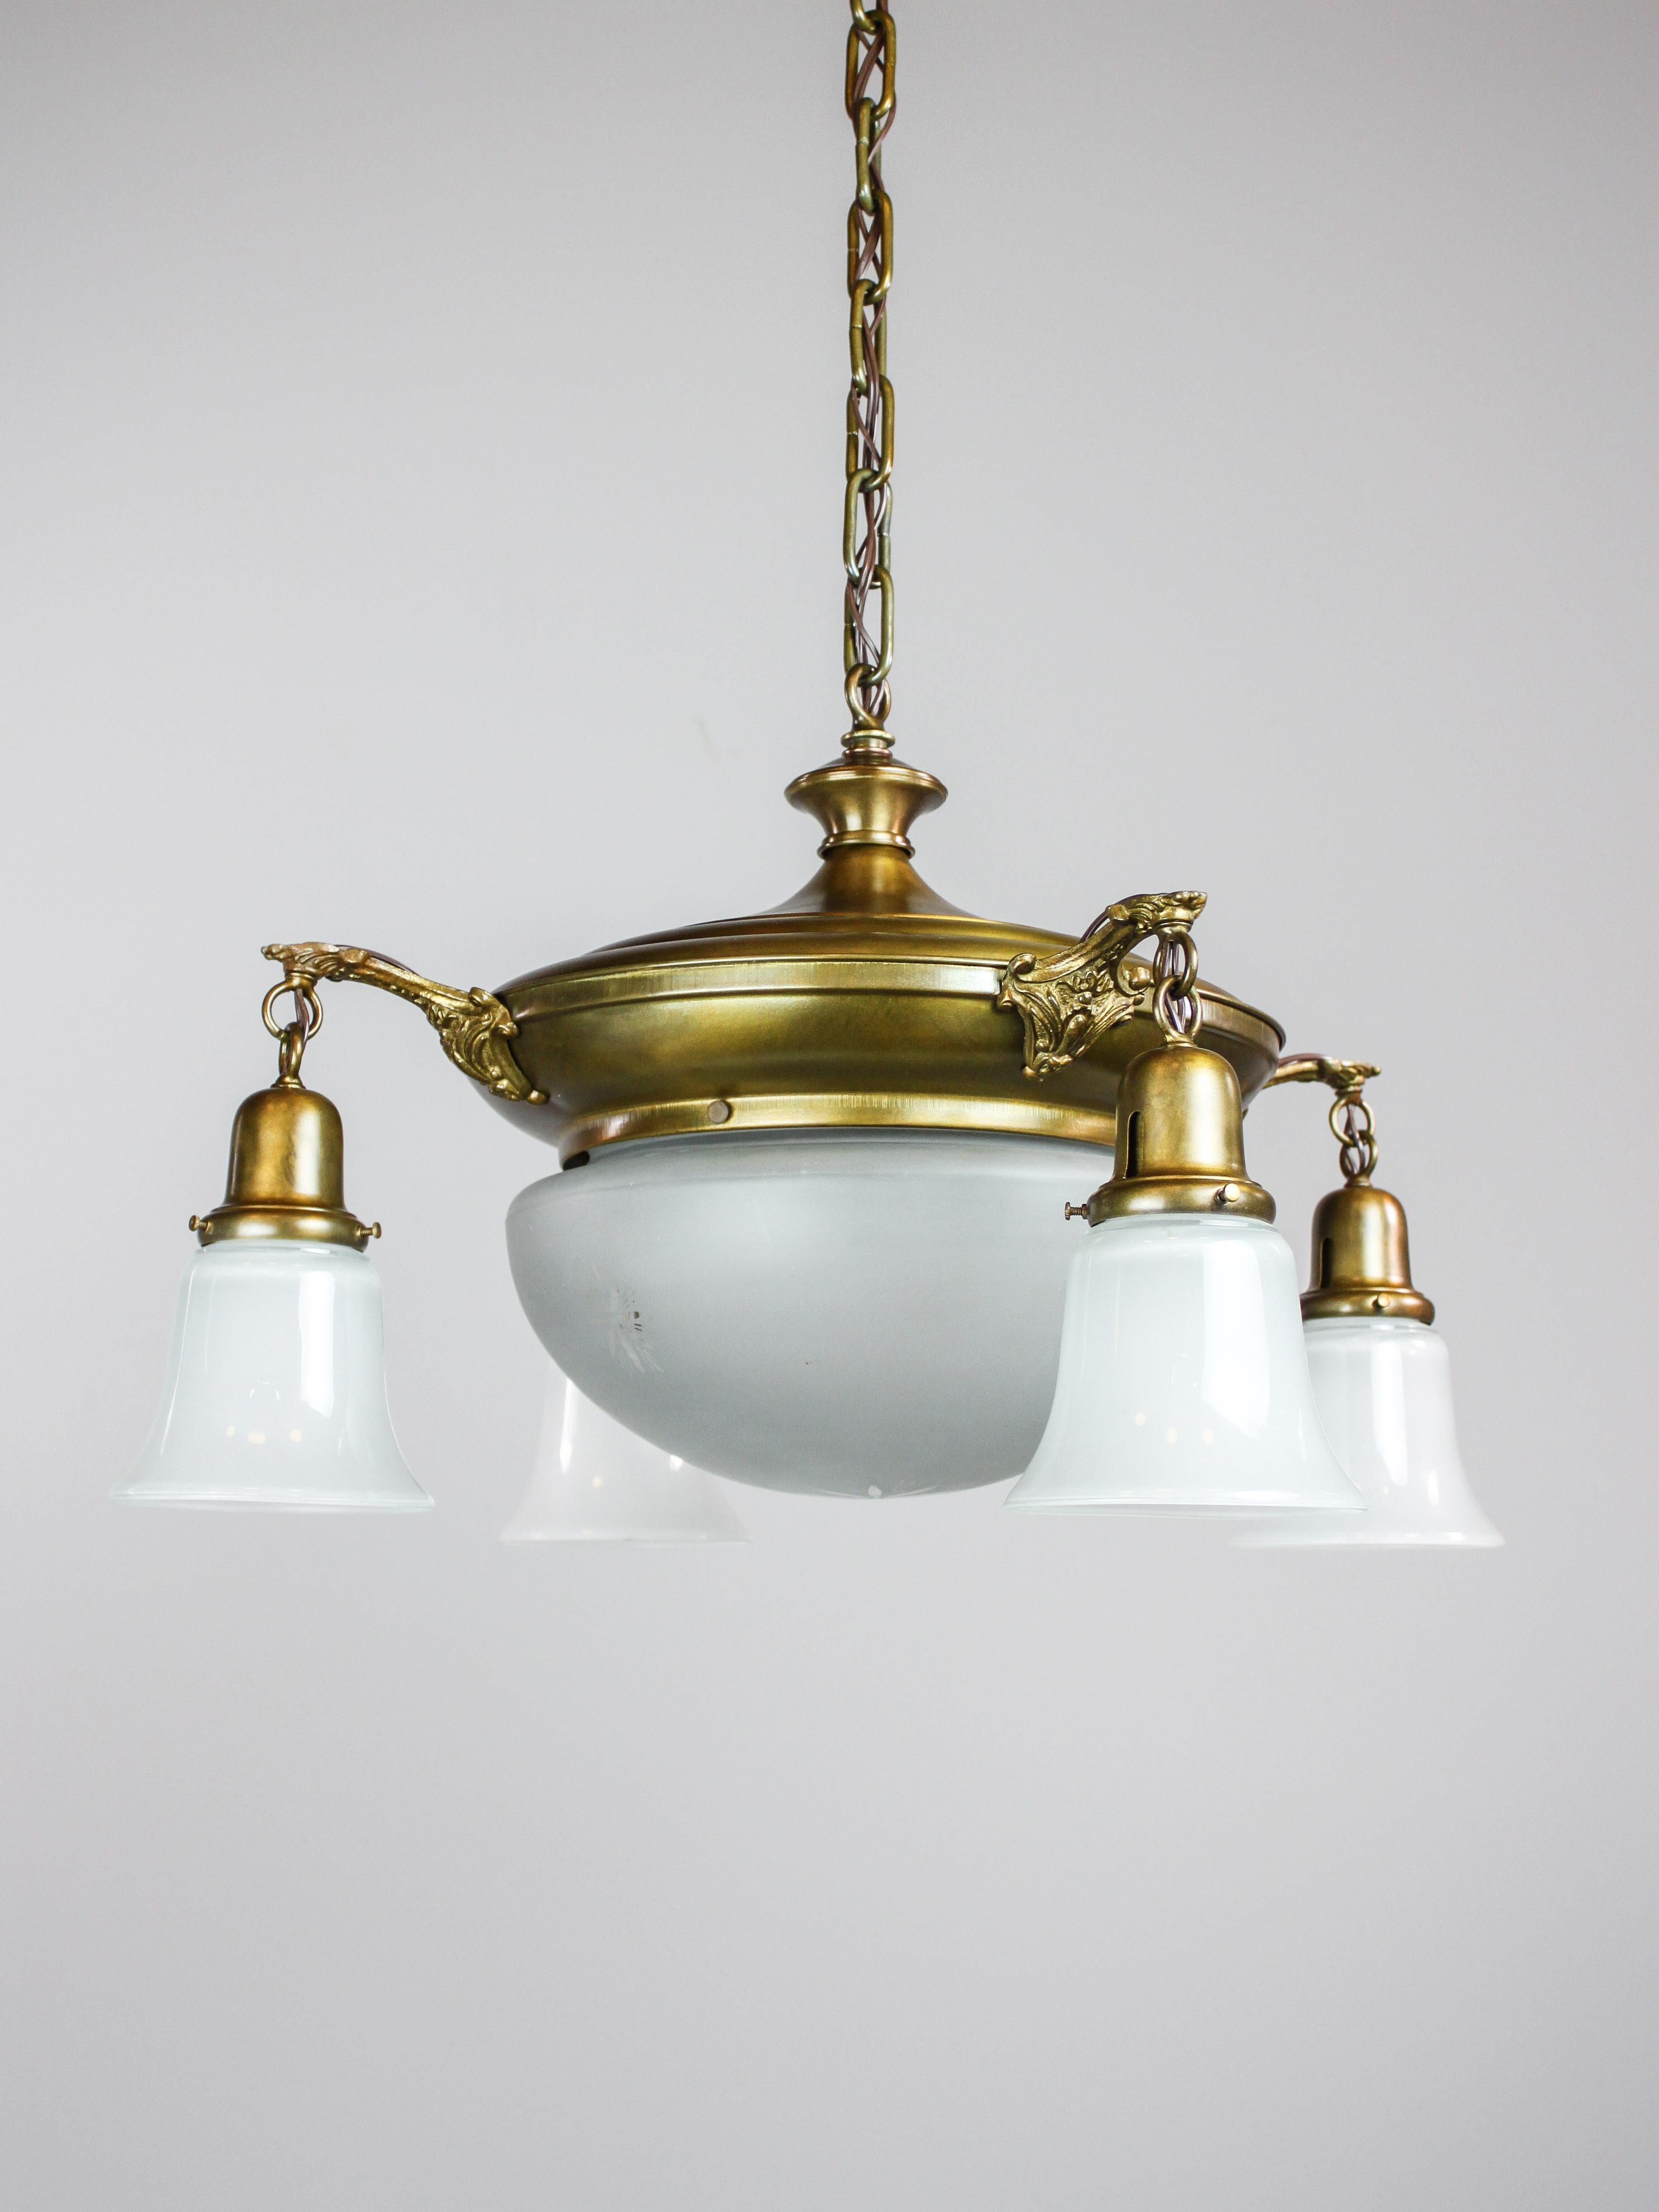 Original Etched Glass Pan Light Fixture 4 1 Light